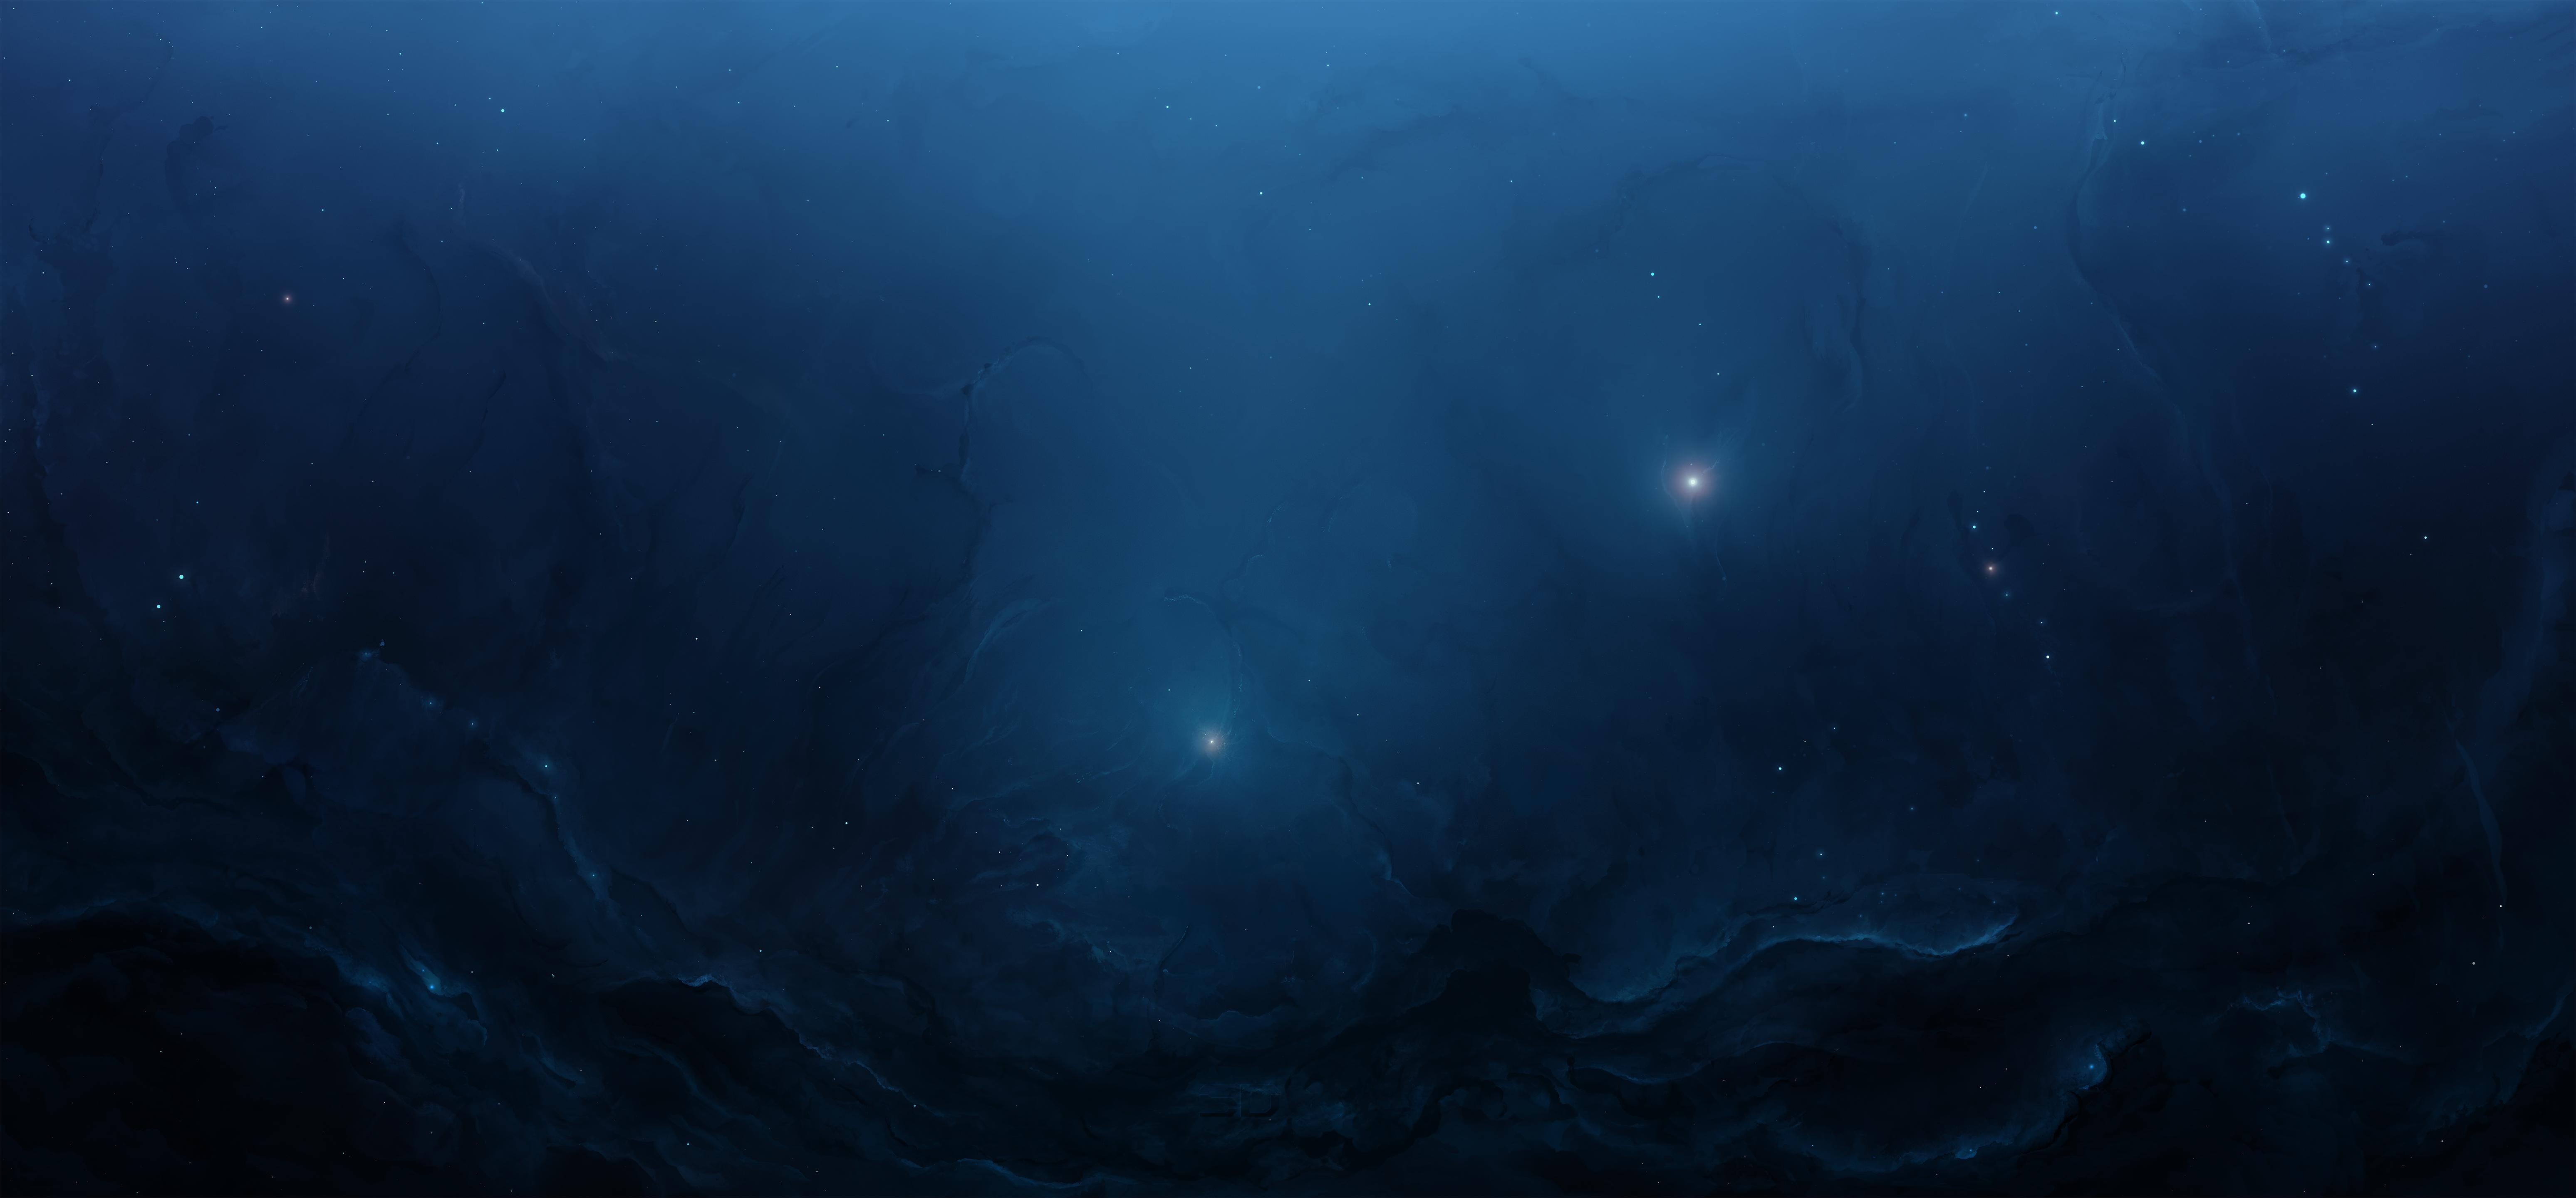 Blue Cosmos Space Stars 6192x2880